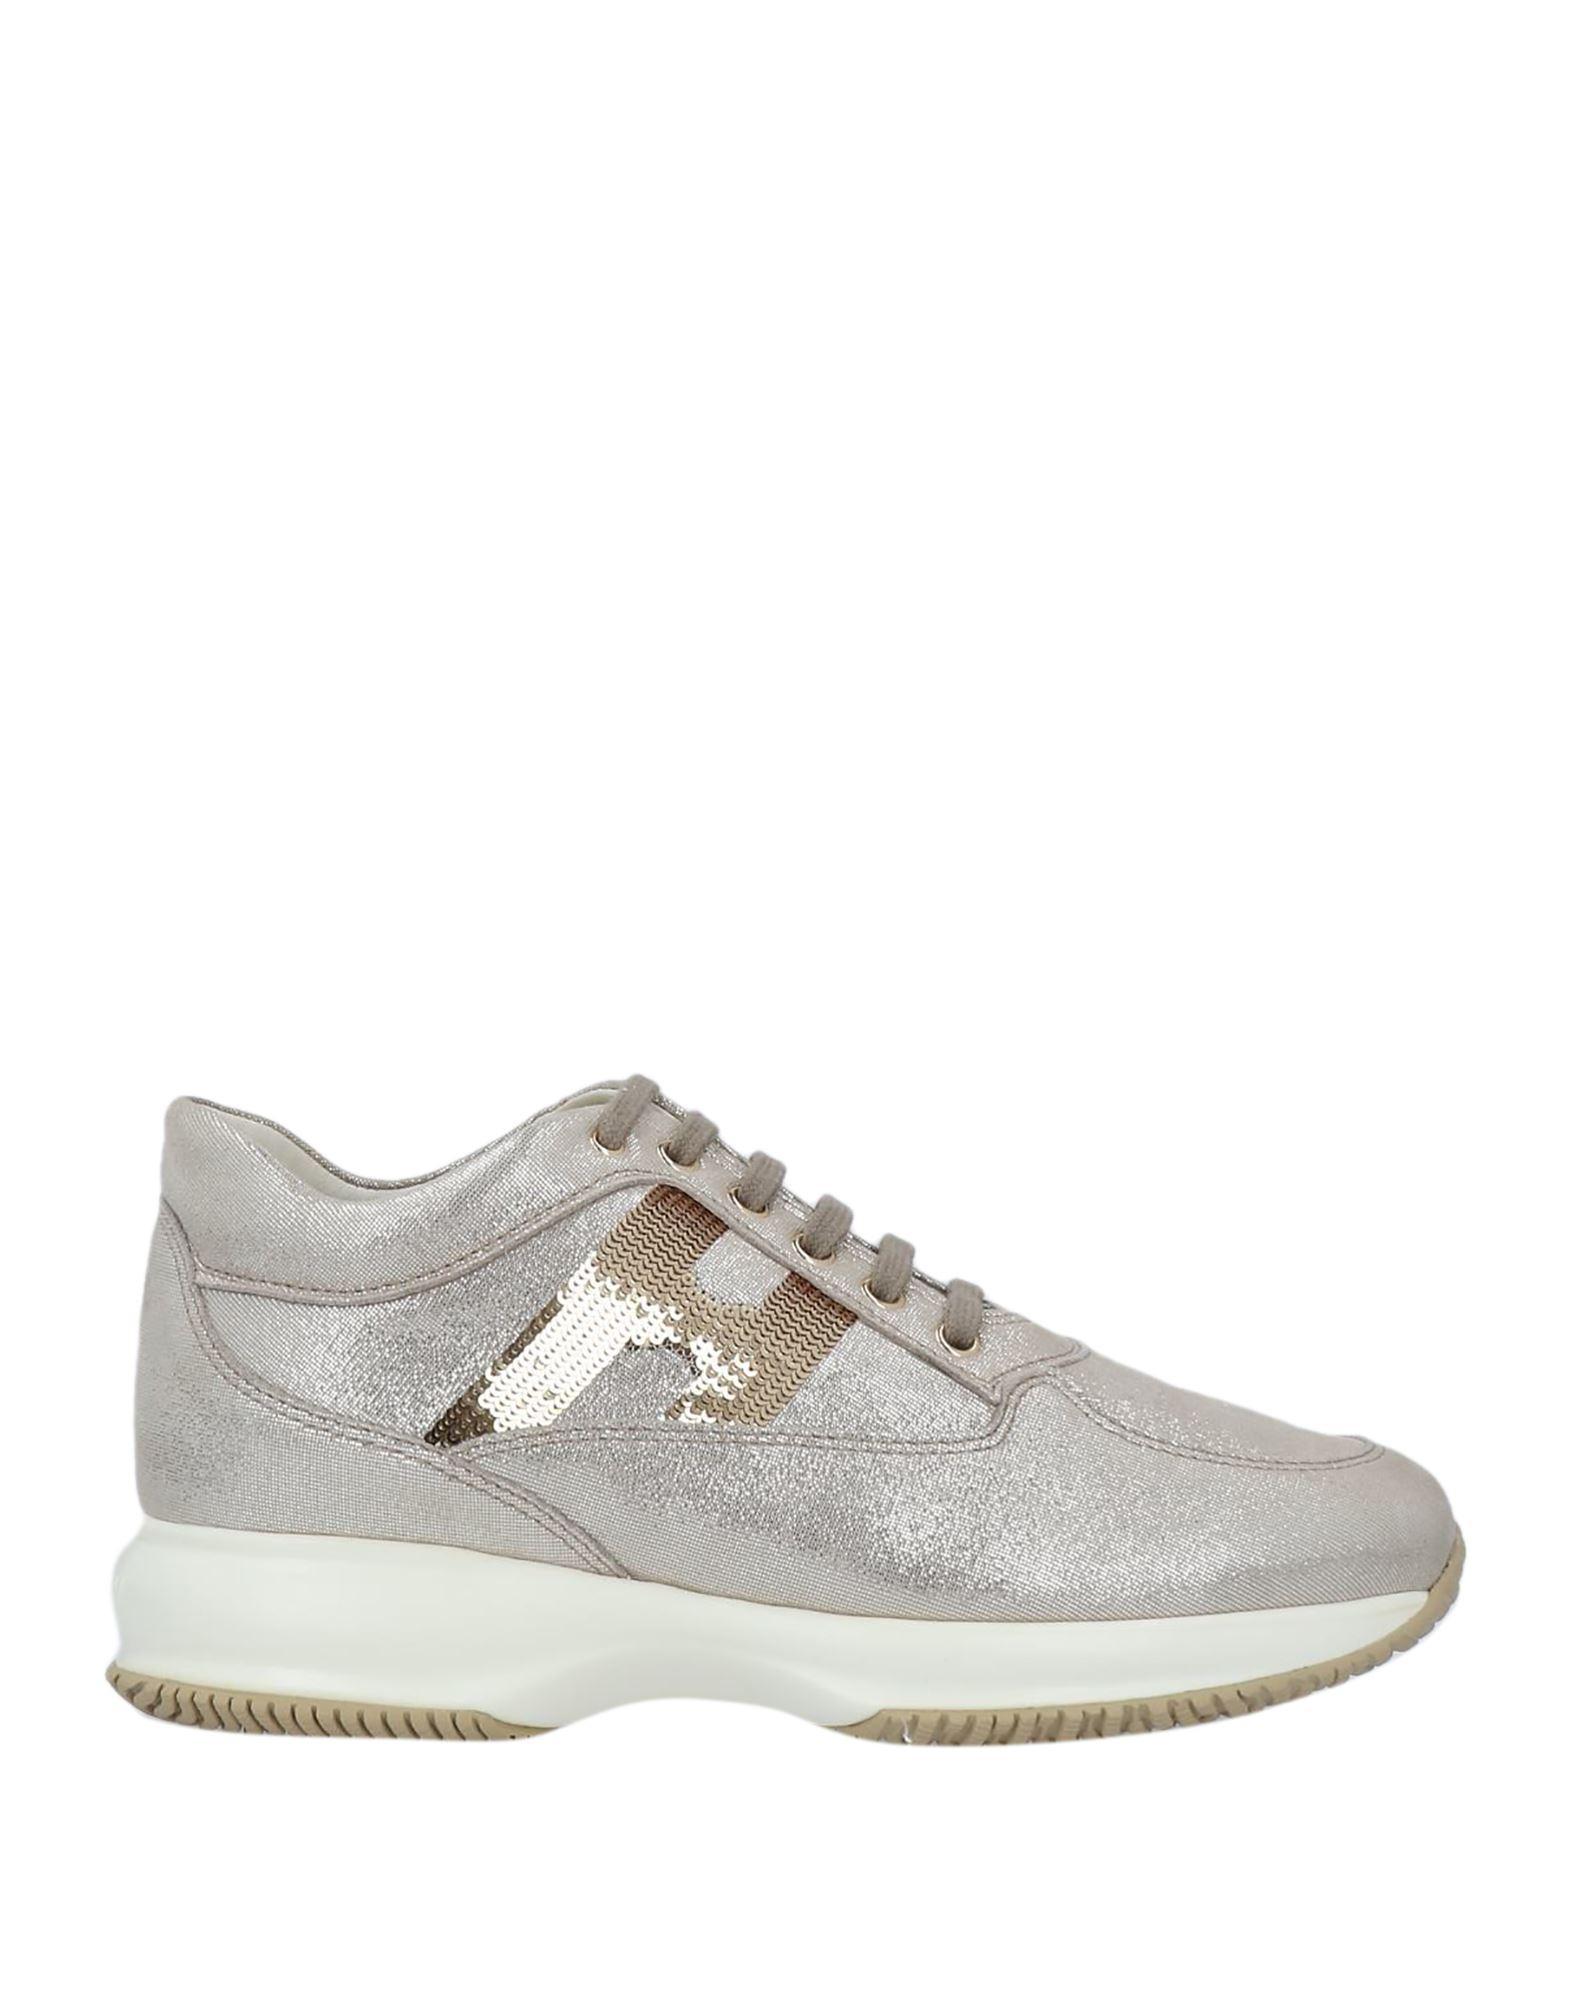 Hogan Sneakers in Platinum (Grey) - Lyst